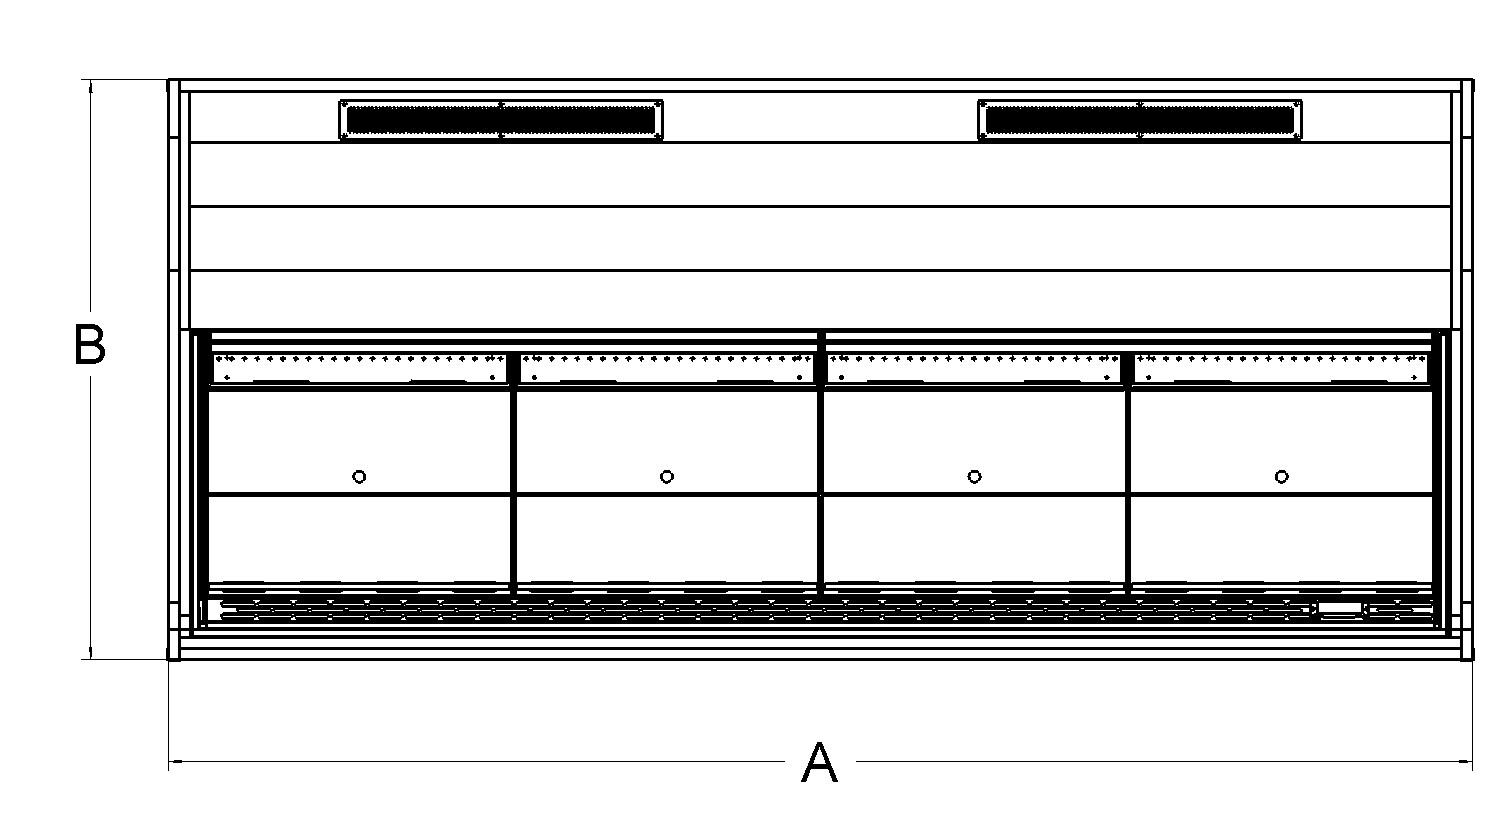 RBS038HV-49 TOP LINE DWG